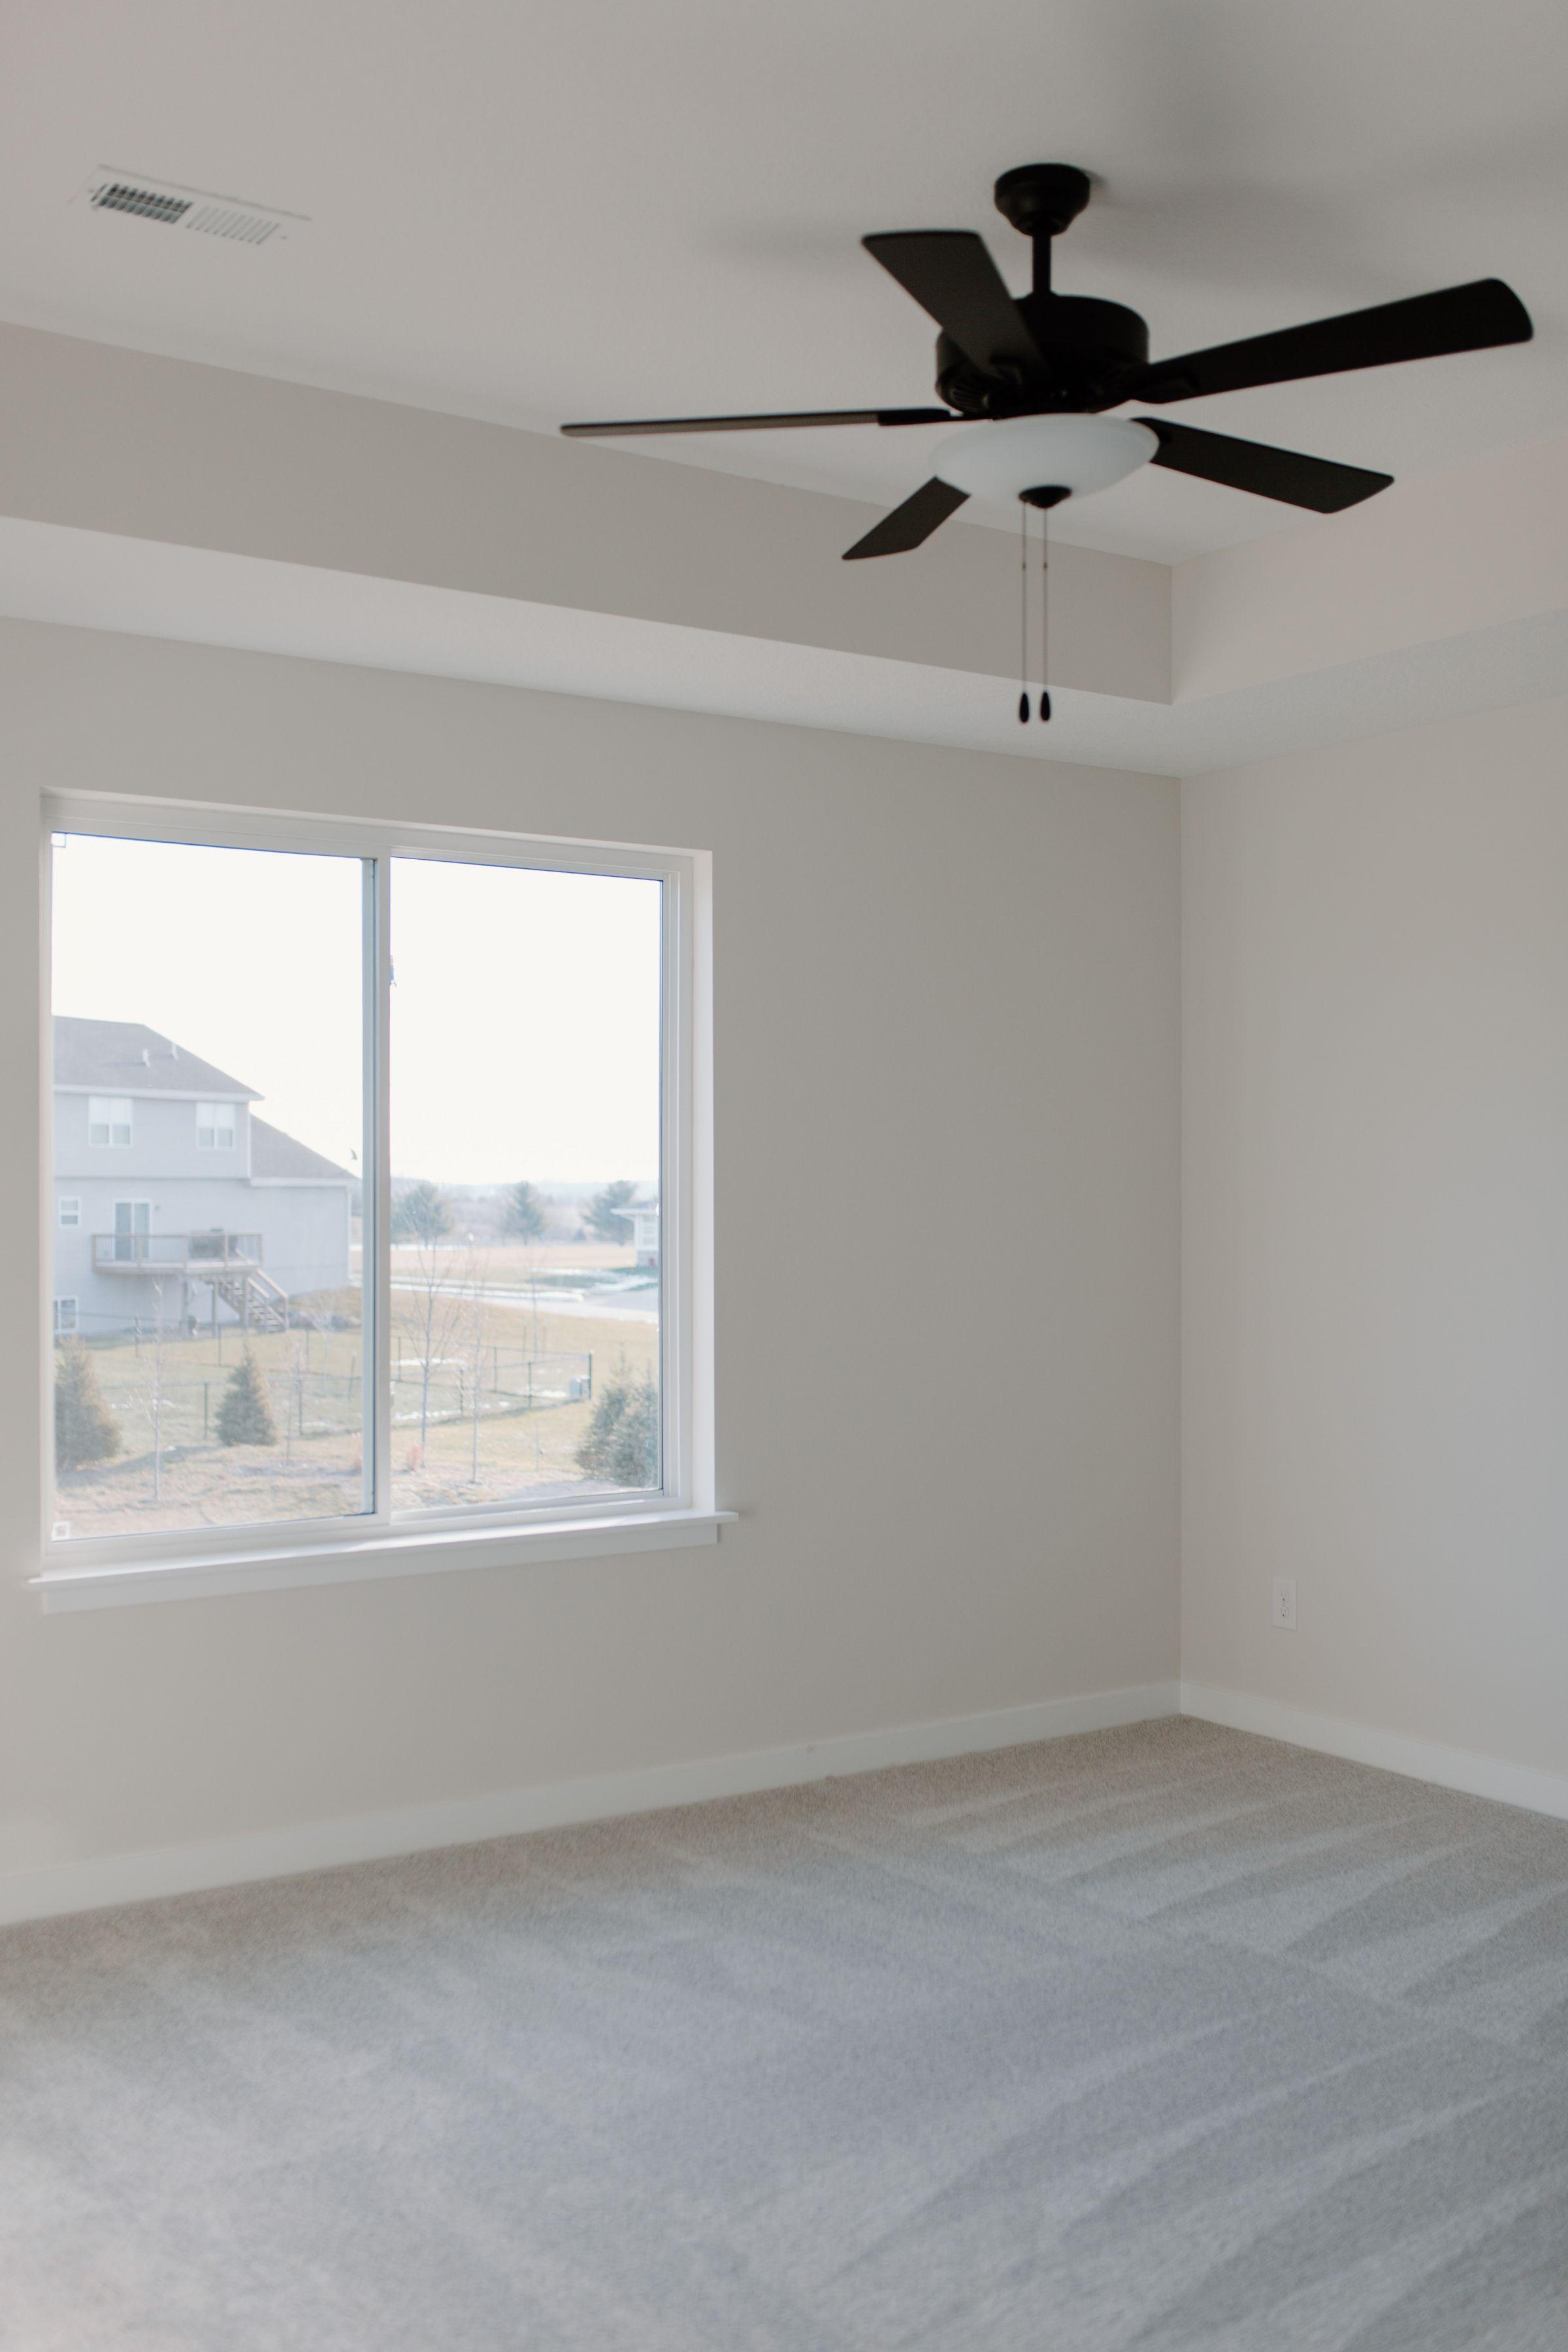 residential-warren-county-iowa-0-acres-listing-number-15367-11-2021-02-18-210415.jpg